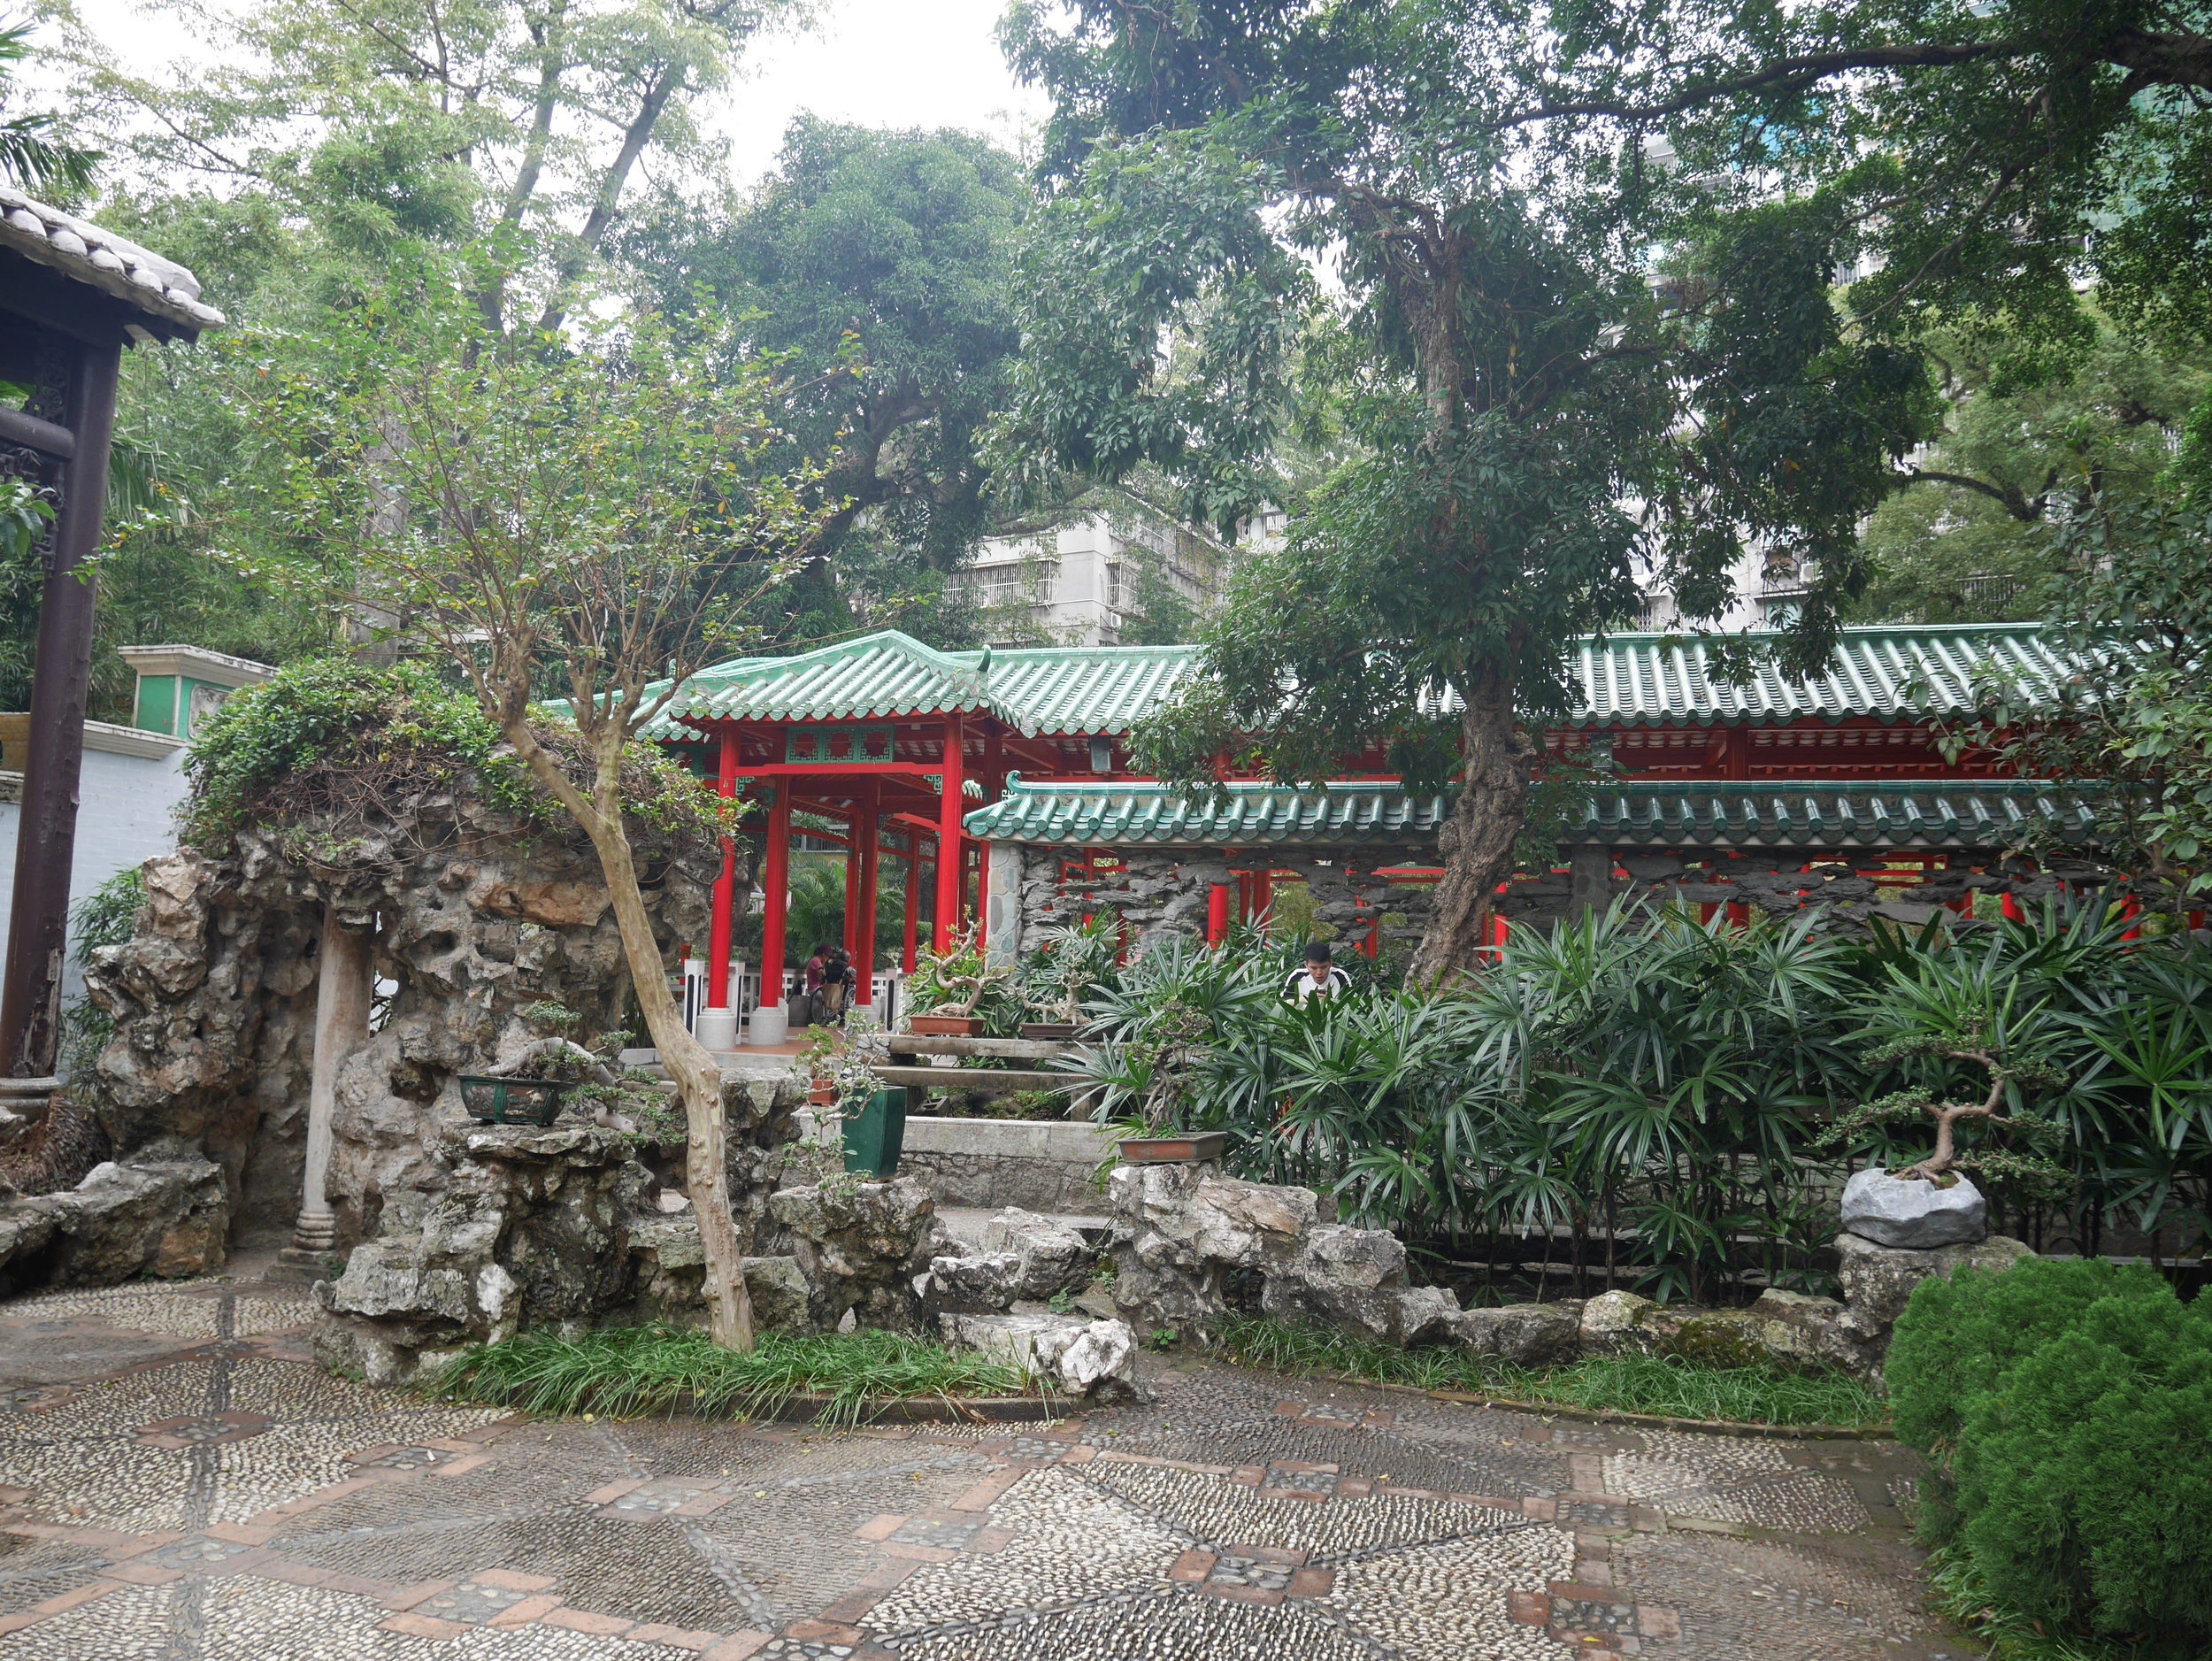 Lou Lim loc Garden